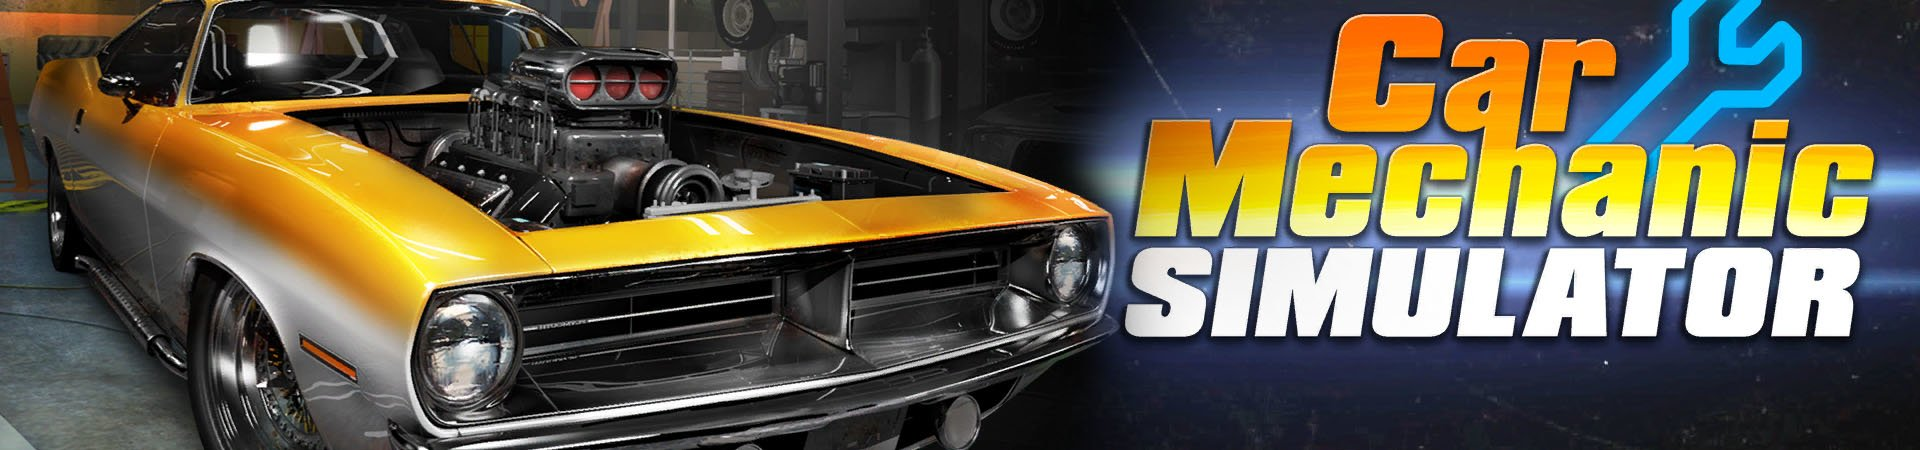 Car Mechanic Simulator (PS4) Review   GamePitt - PlayWay